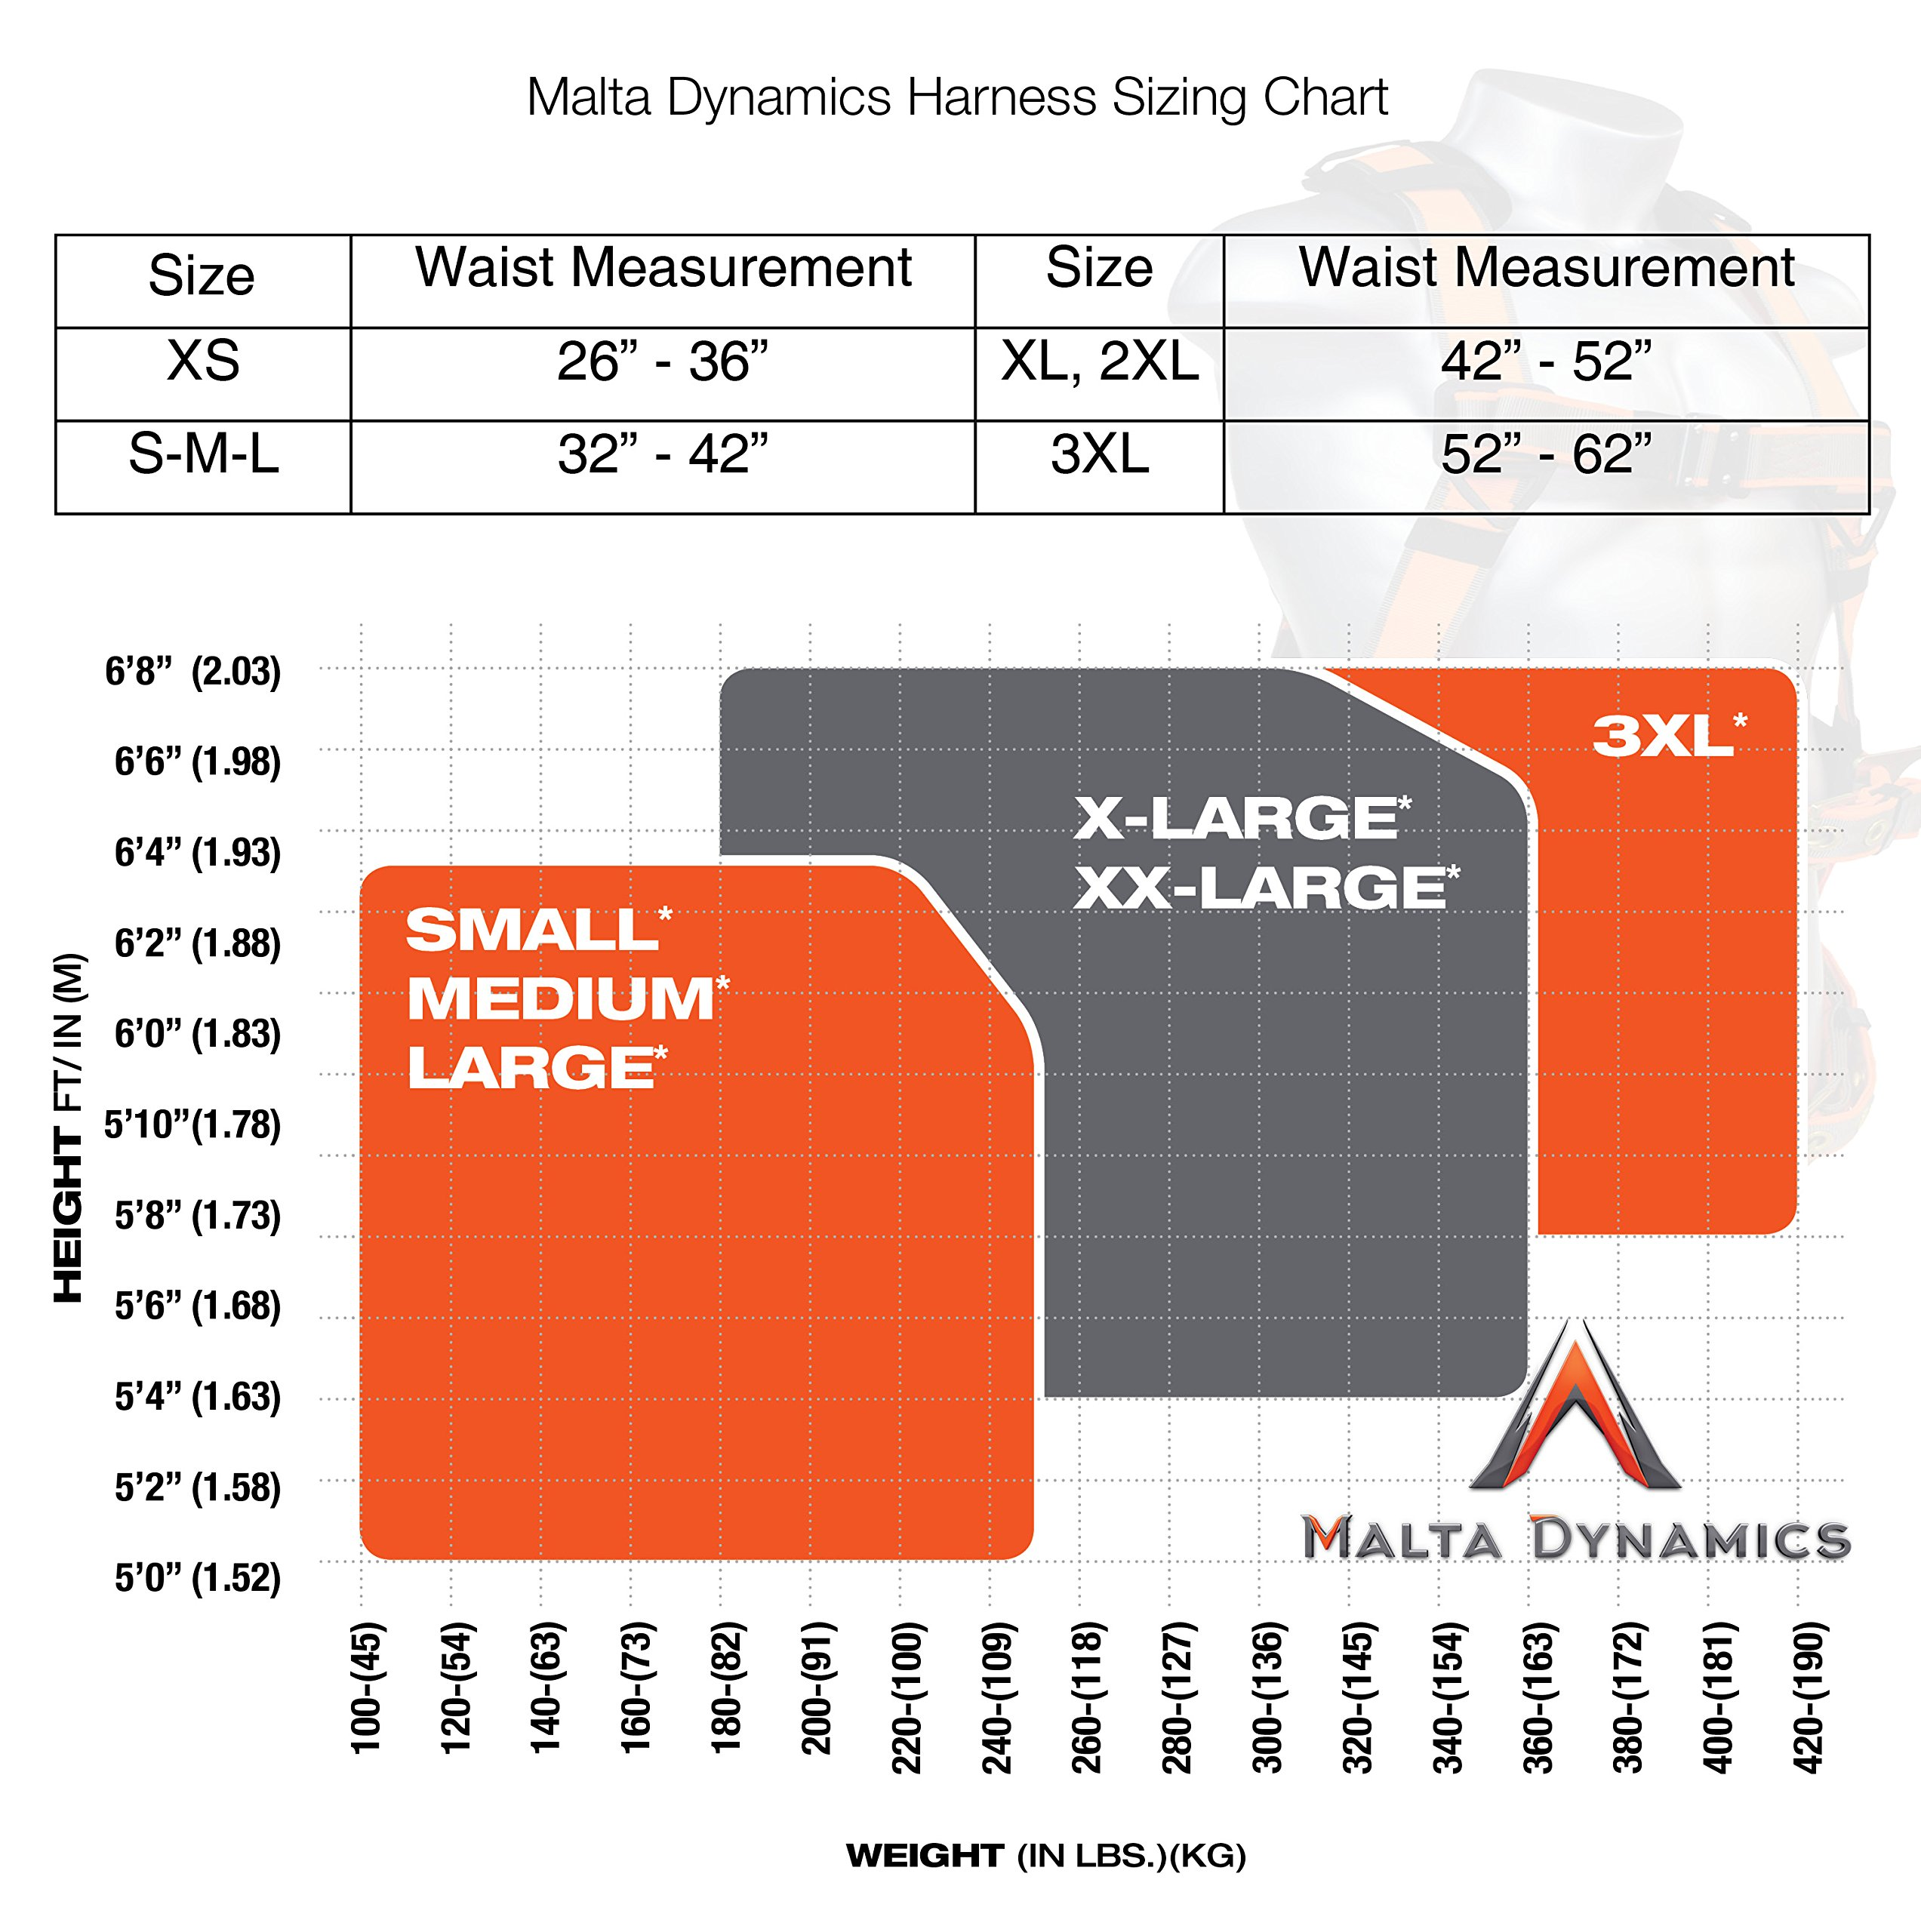 Warthog Full Body Universal Harness with Pass-Thru Leg Buckles (XXXL), OSHA/ANSI Compliant by Malta Dynamics (Image #3)